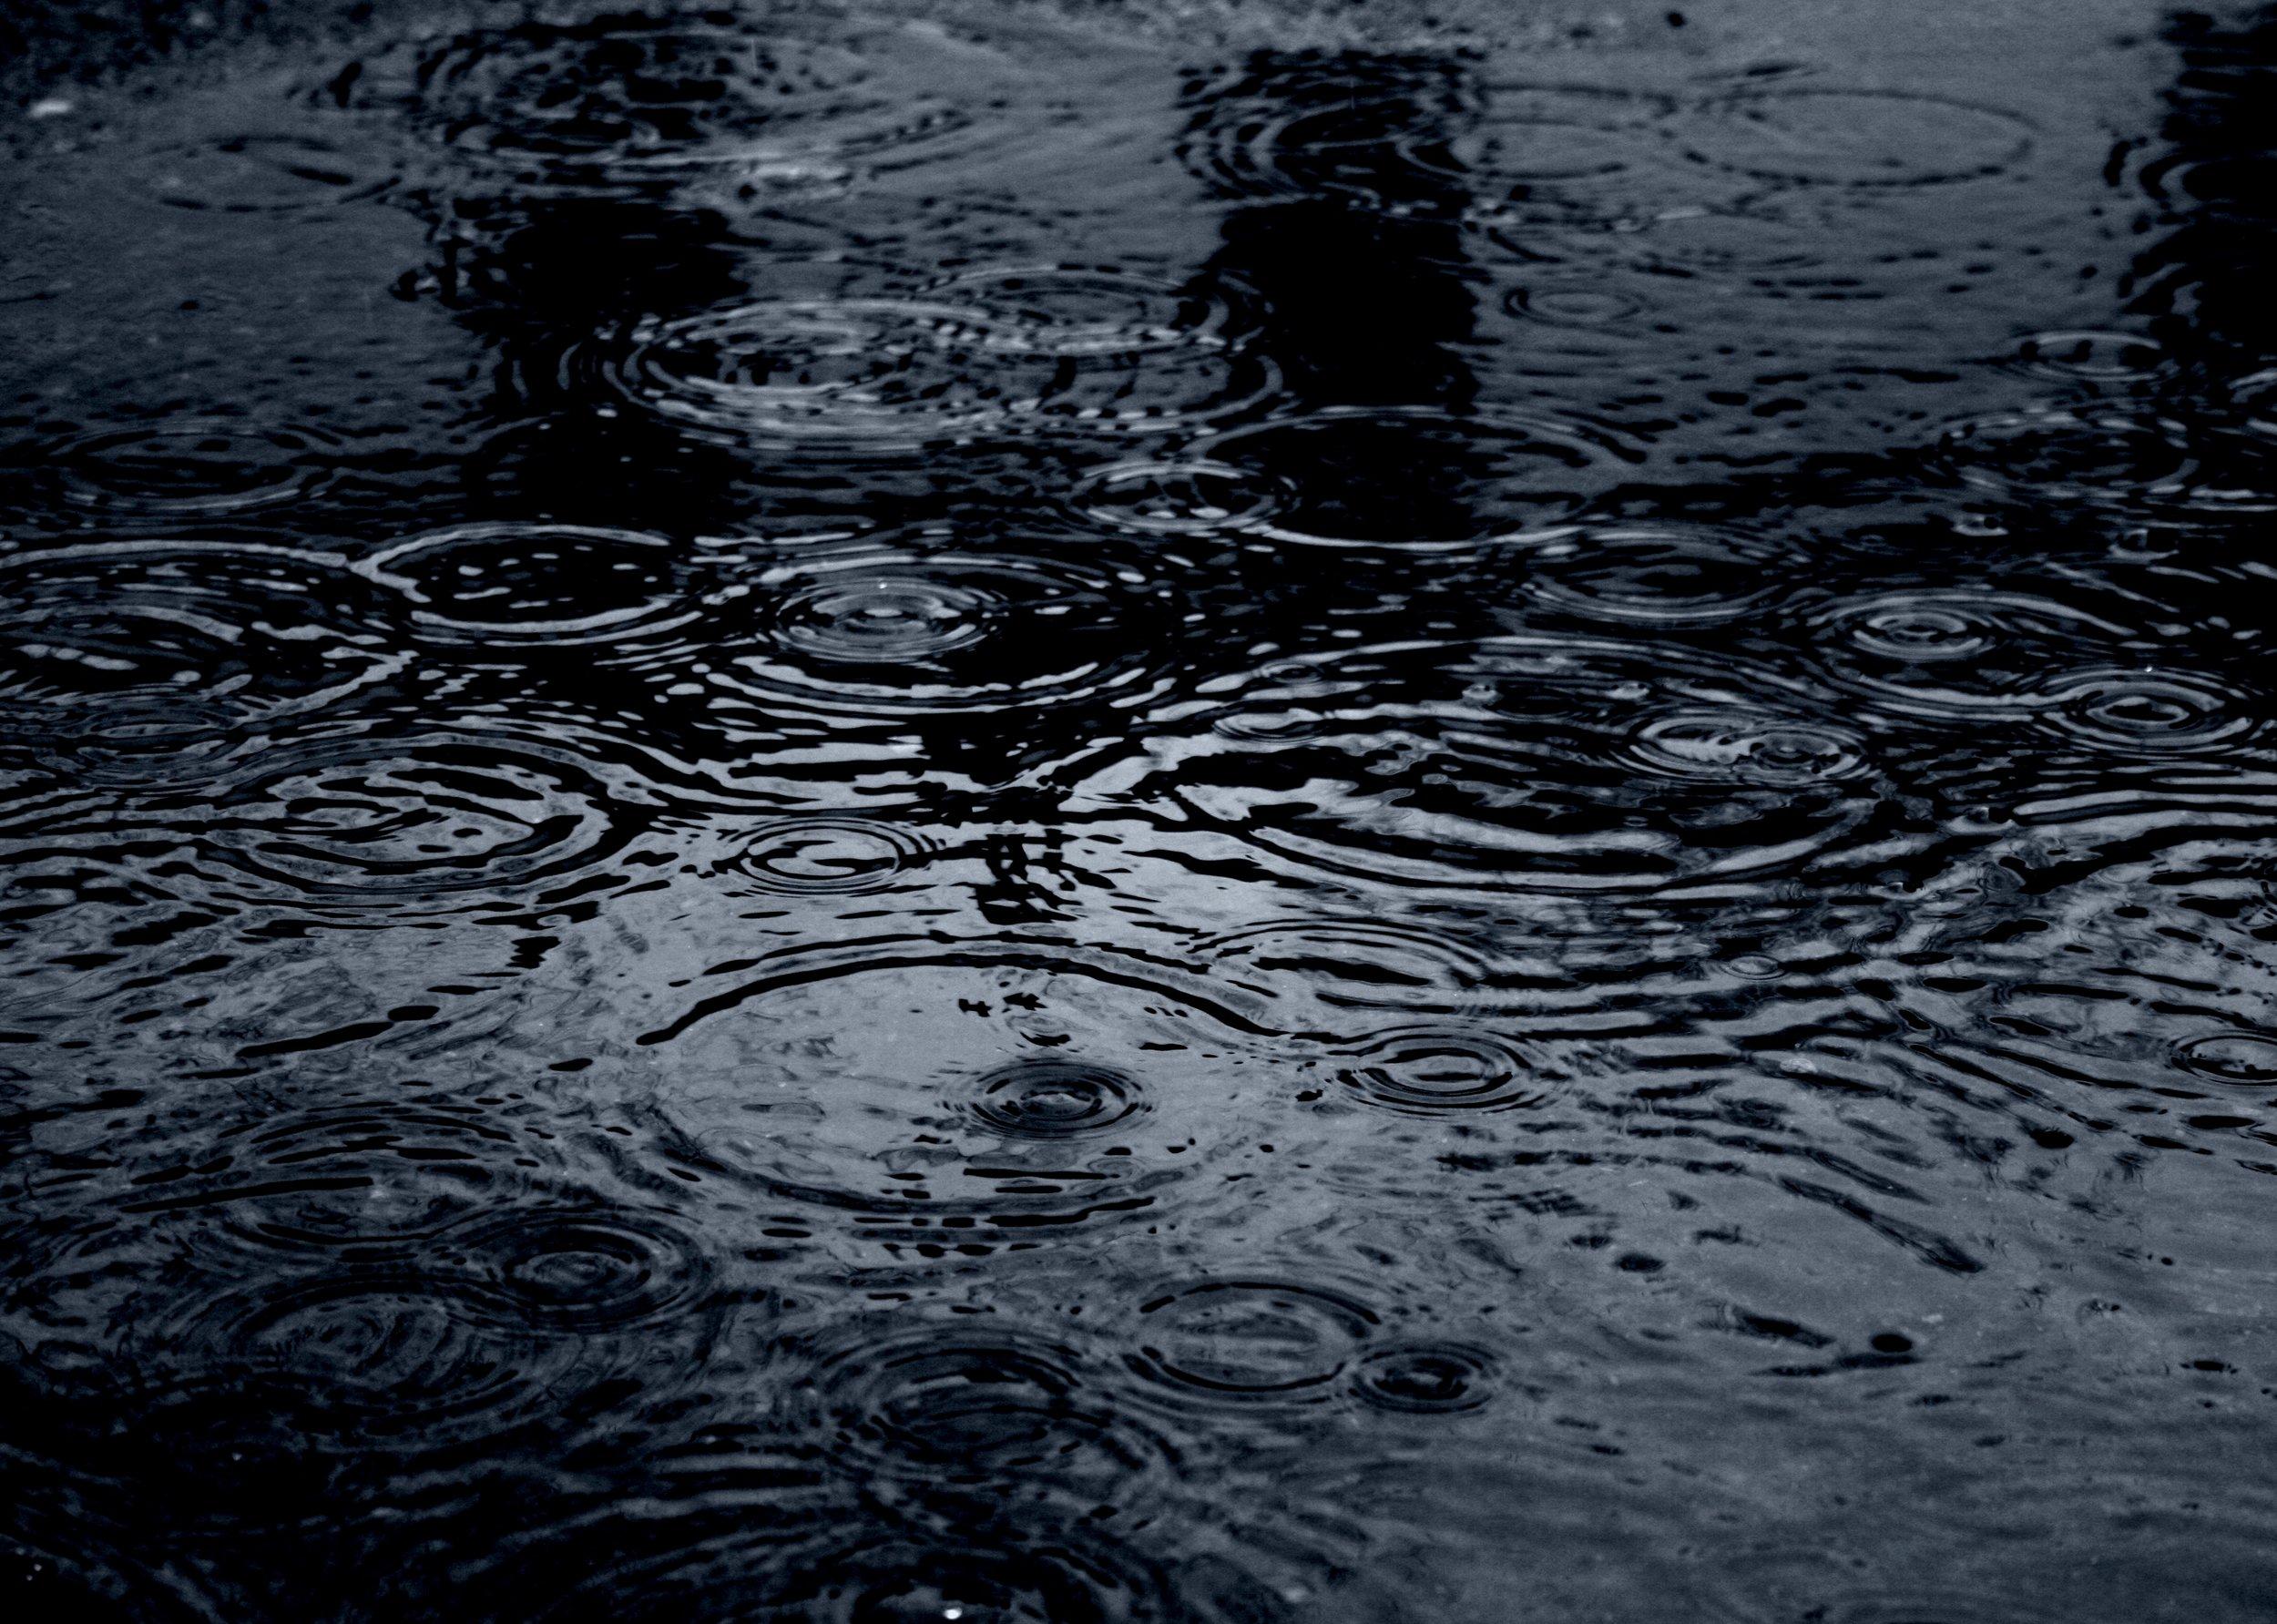 Moody_Raindrops_In_Dark_Blue_Puddle_(2387754376).jpg